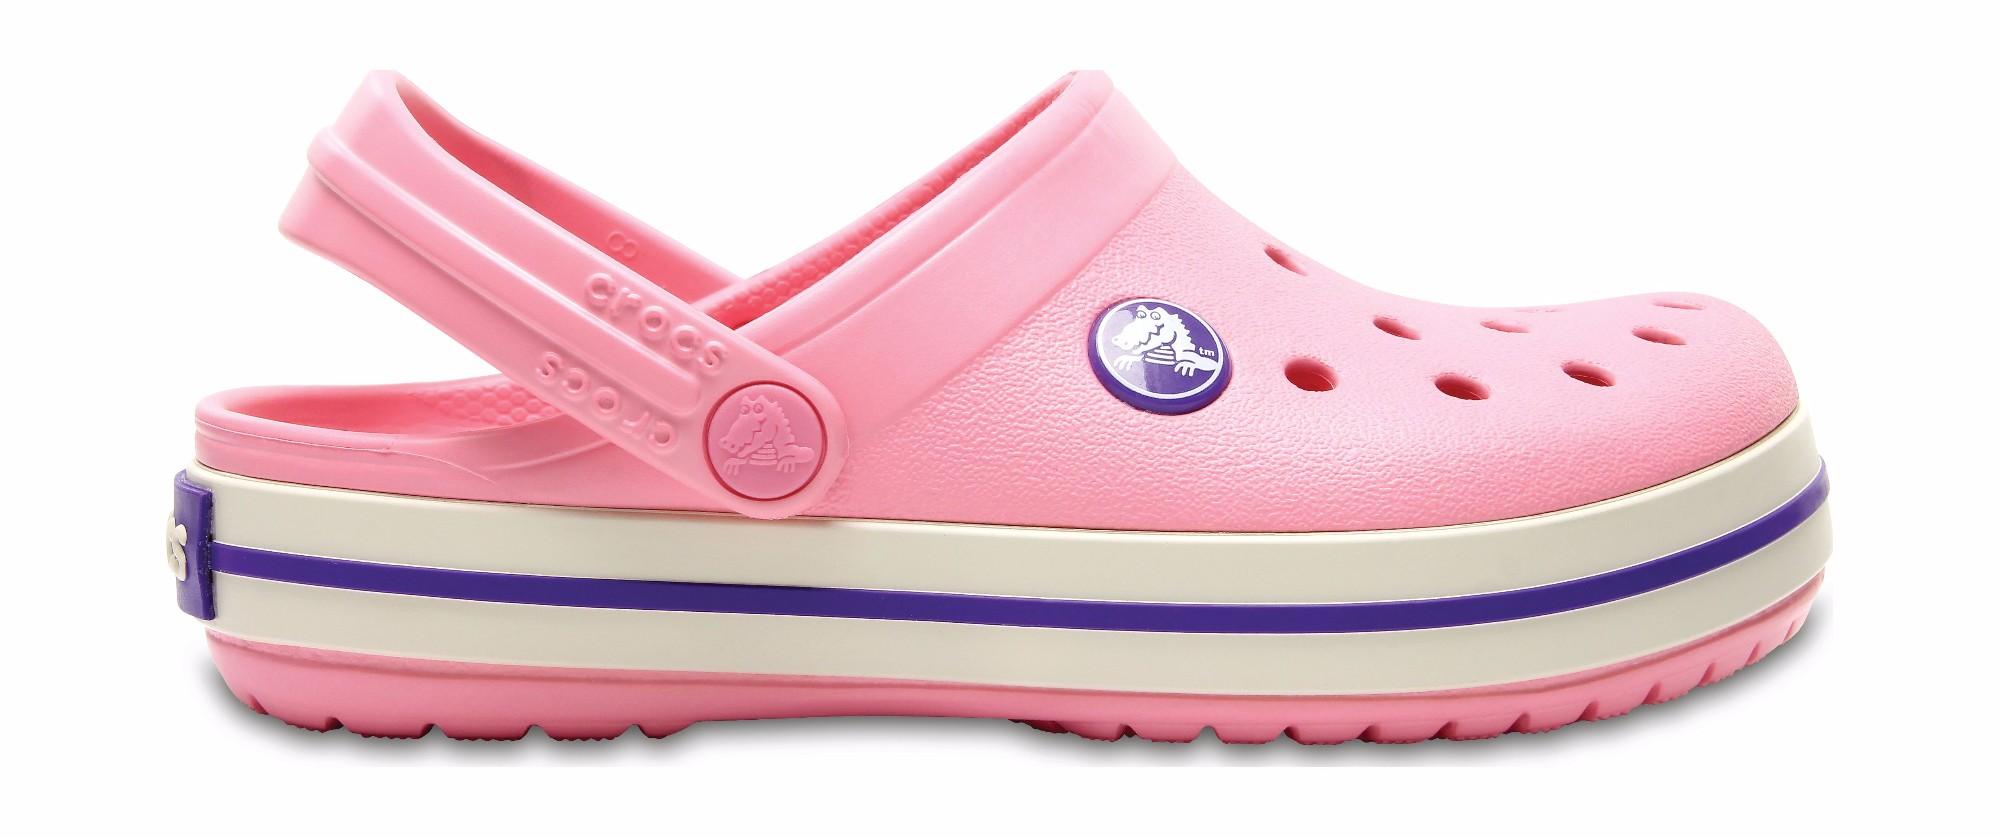 Crocs™ Kids' Crocband Clog Peony Pink/Stucco 32